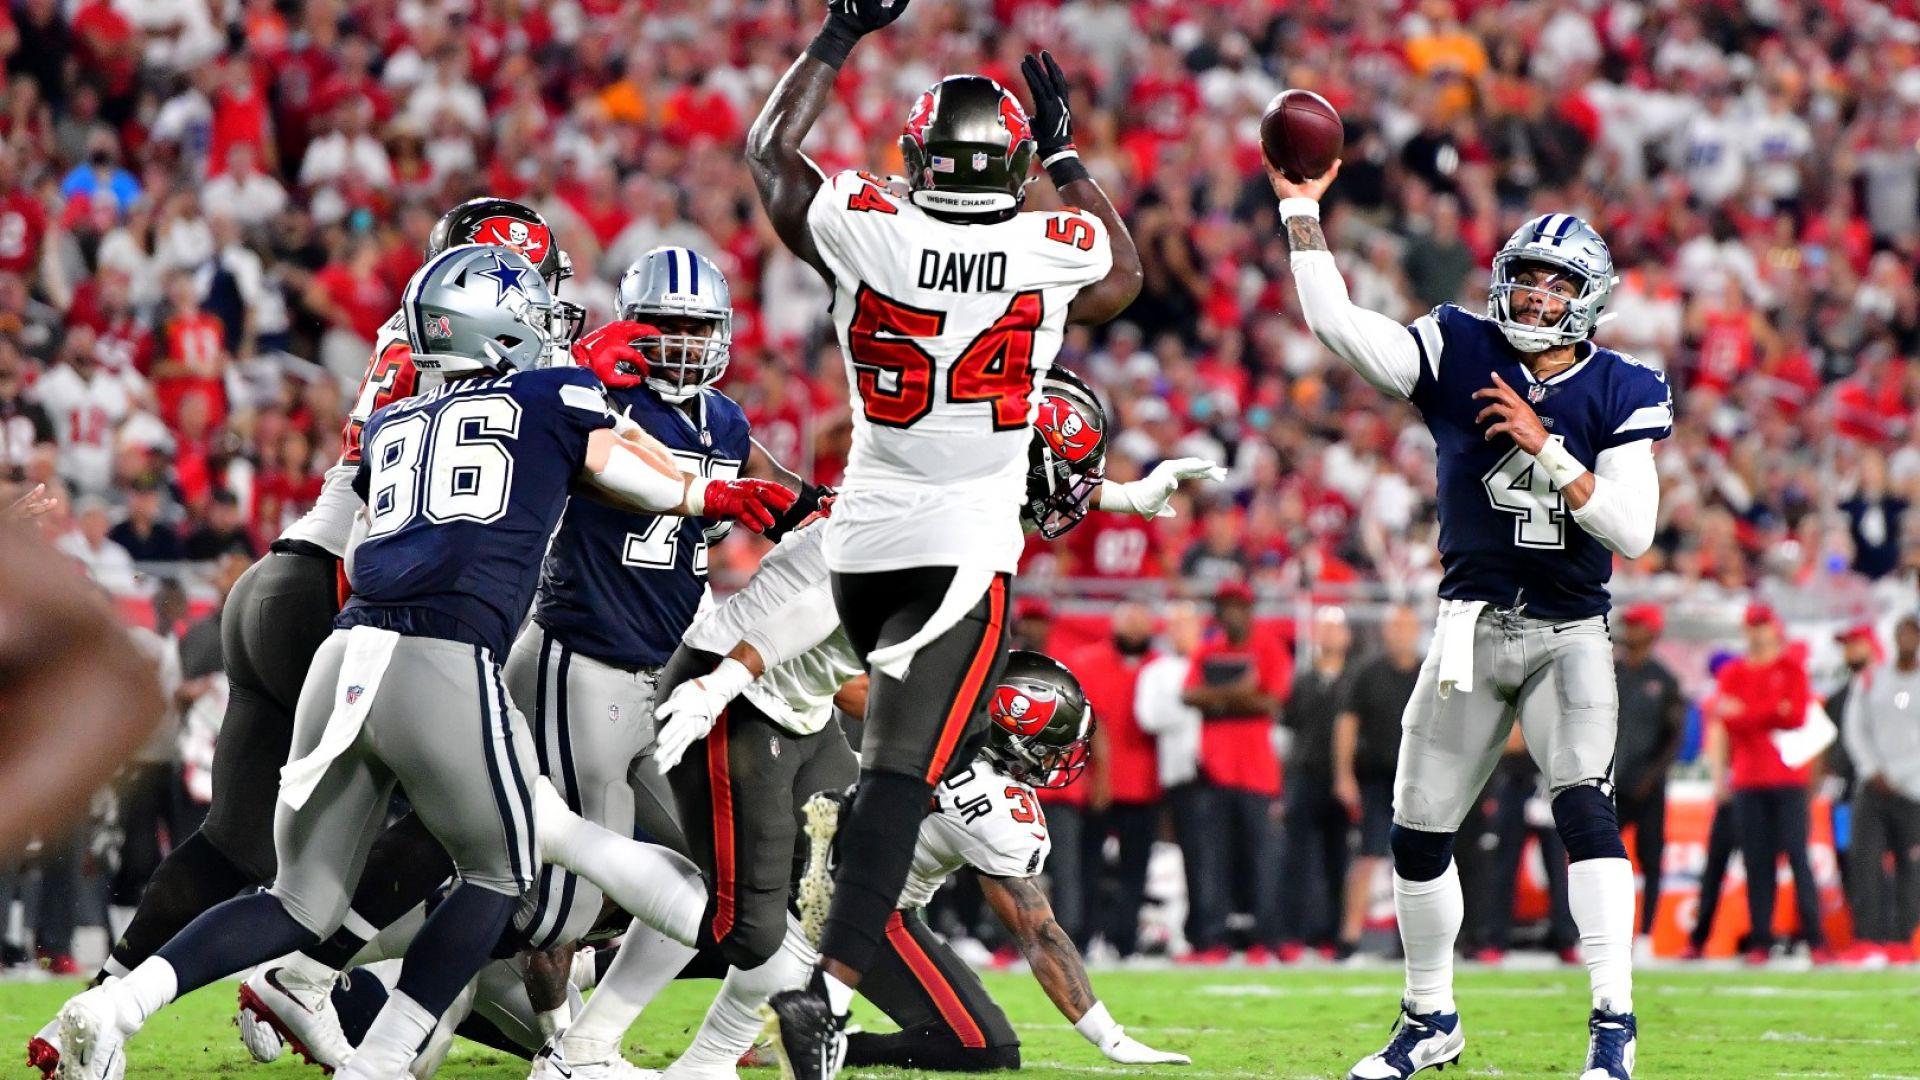 Далас бе на 7 секунди от победа над шампиона на старта на сезона в NFL